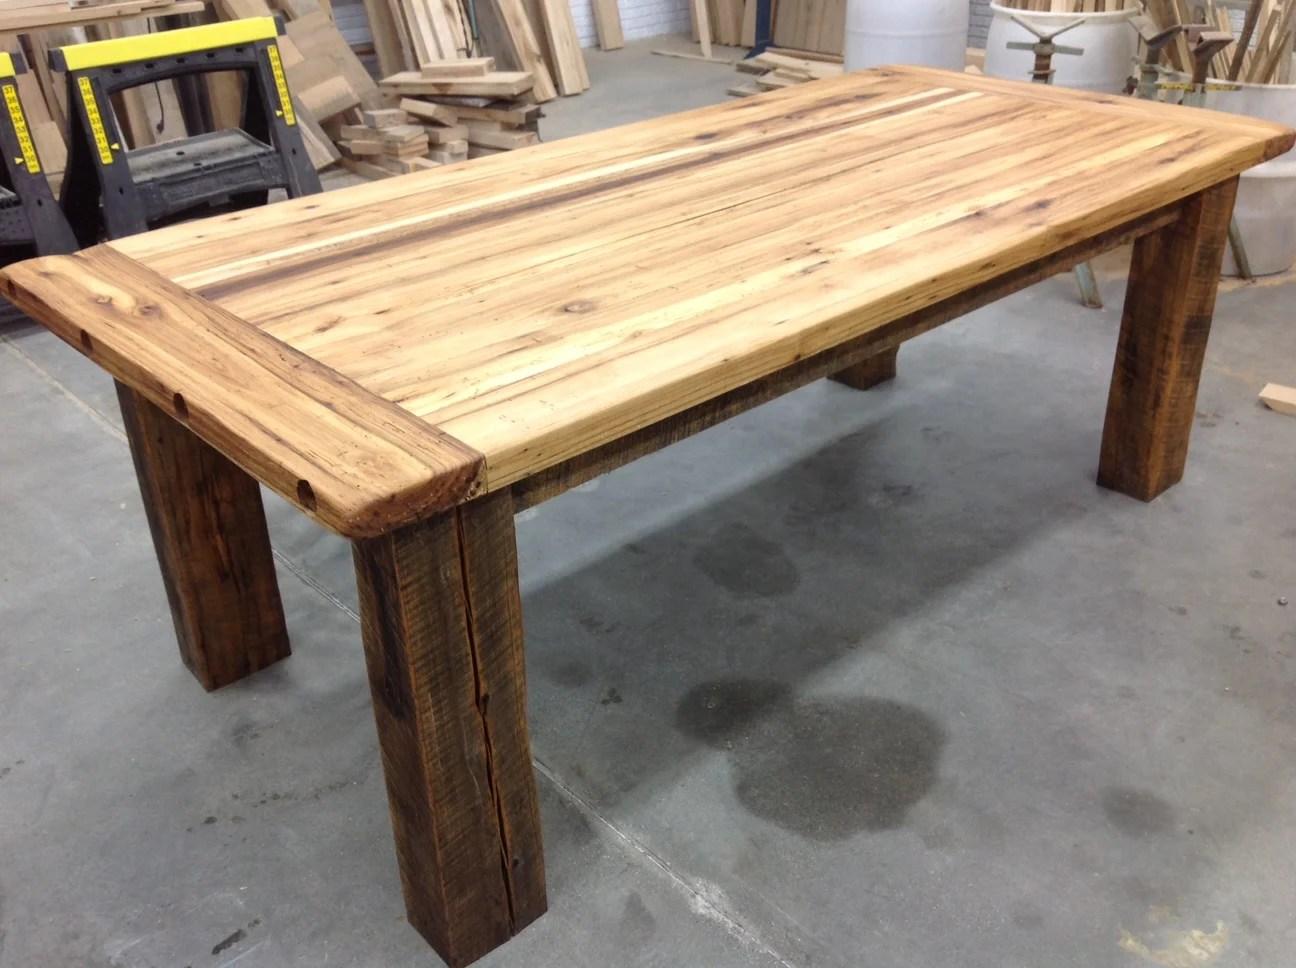 hickory farm table side left reclaimed wood michigan jpg - Hickory Farm Table Side Left Reclaimed Wood Michigan Jpg Designmore